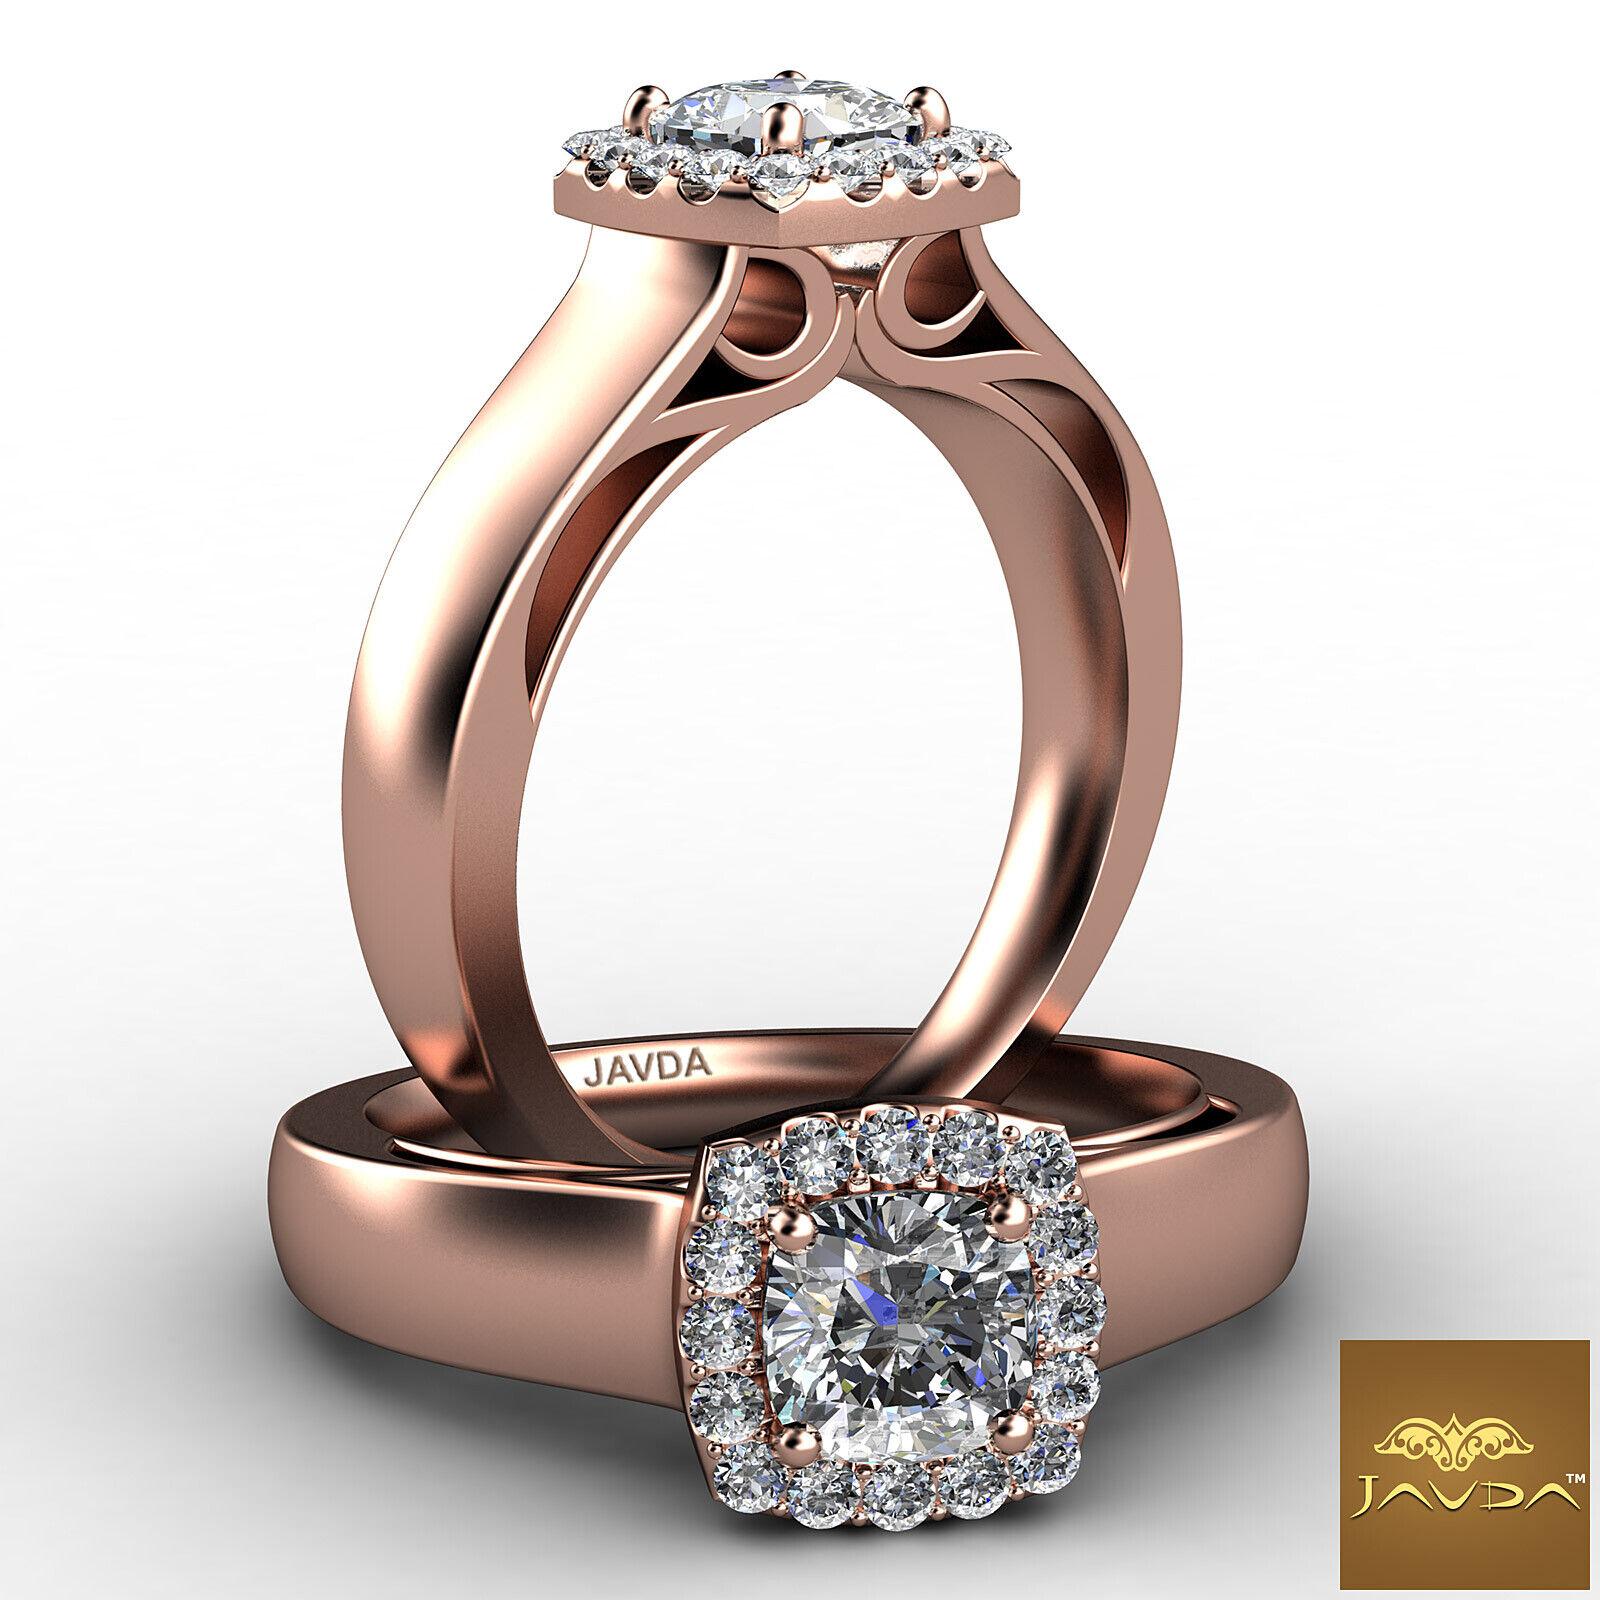 Filigree Shank U Cut Prong Cushion Diamond Engagement GIA H Color VS1 Ring 0.7Ct 8